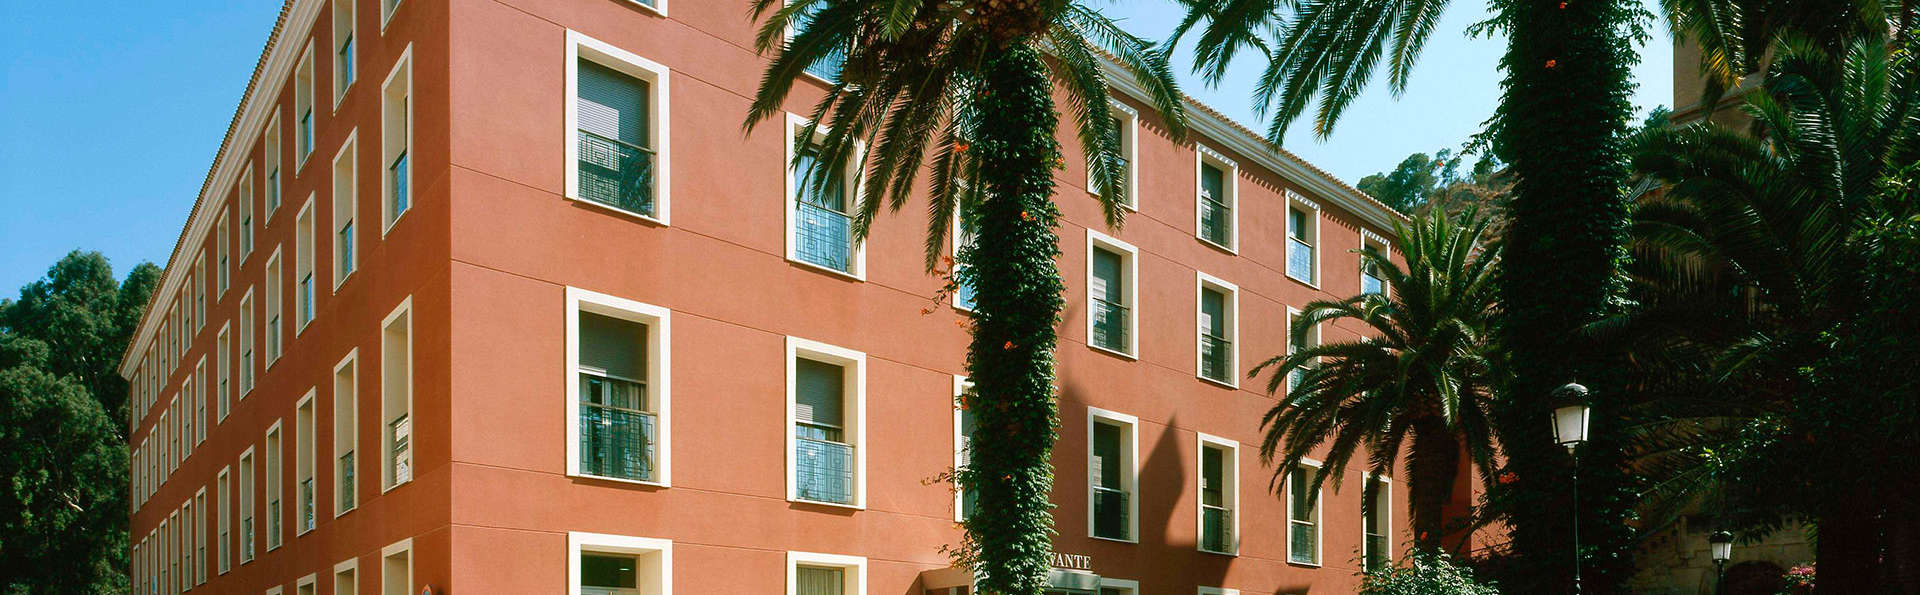 Fotos hotel levante balneario de archena 96